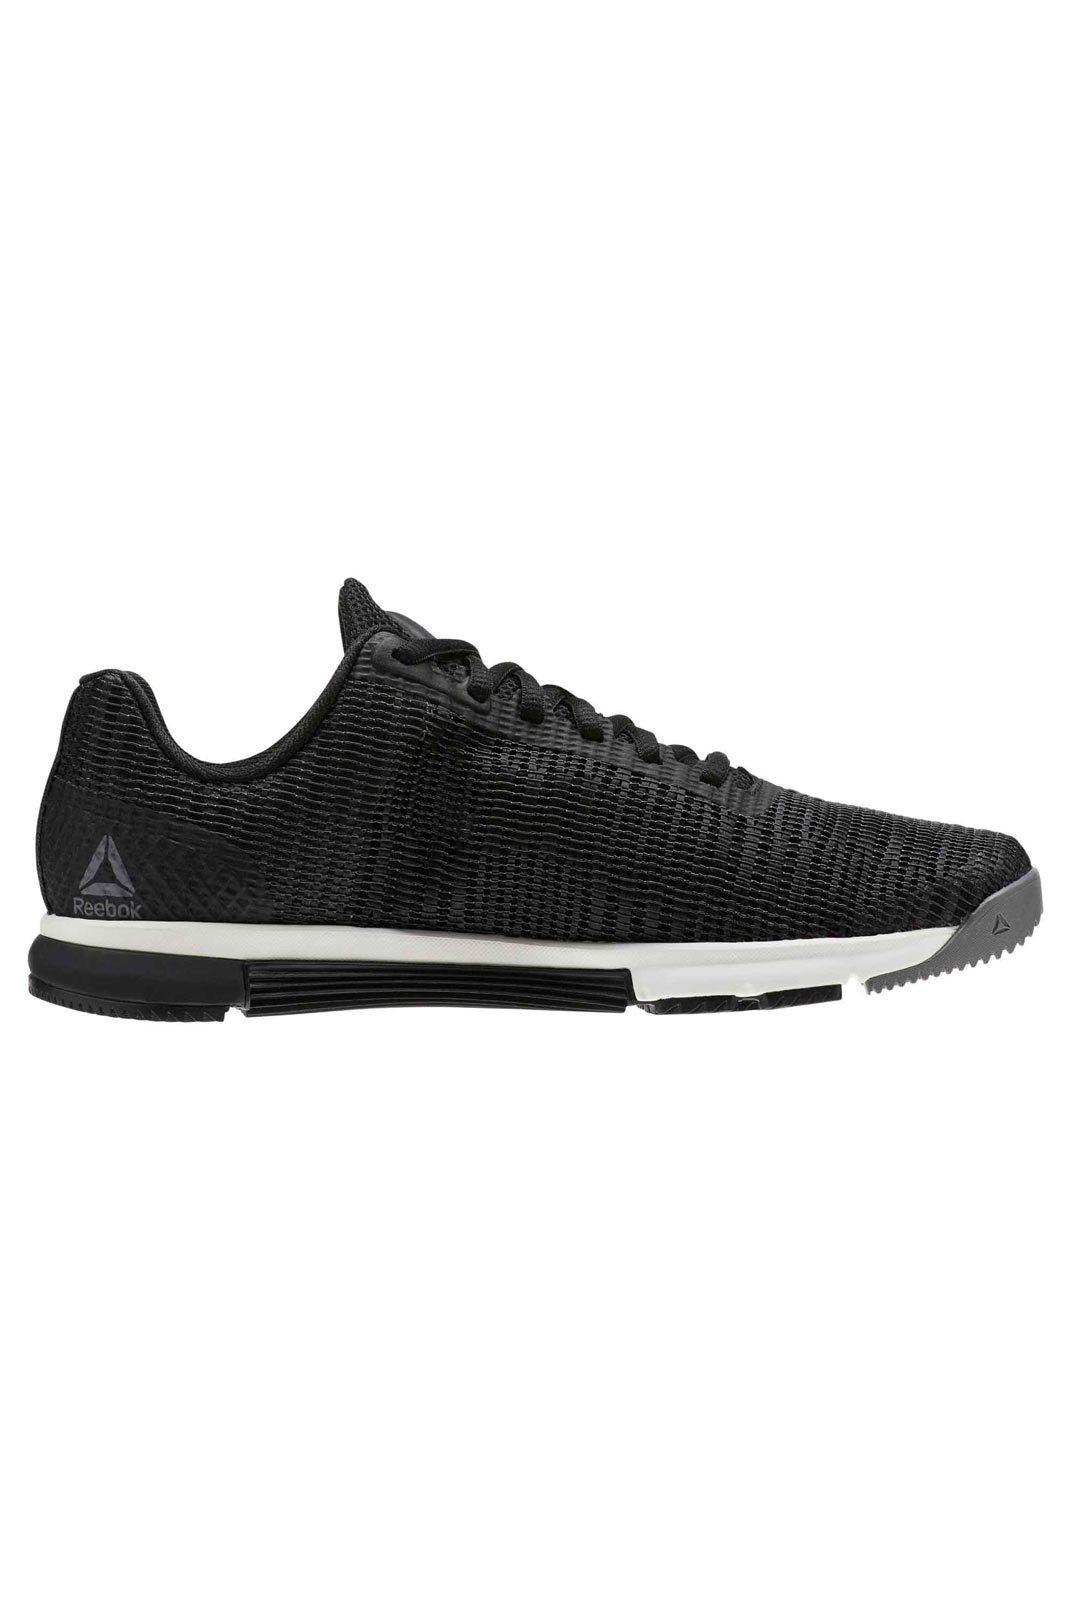 Lyst - Reebok Speed Tr Flexweave Fitness Shoes Black in Black - Save ... e95671f1e197